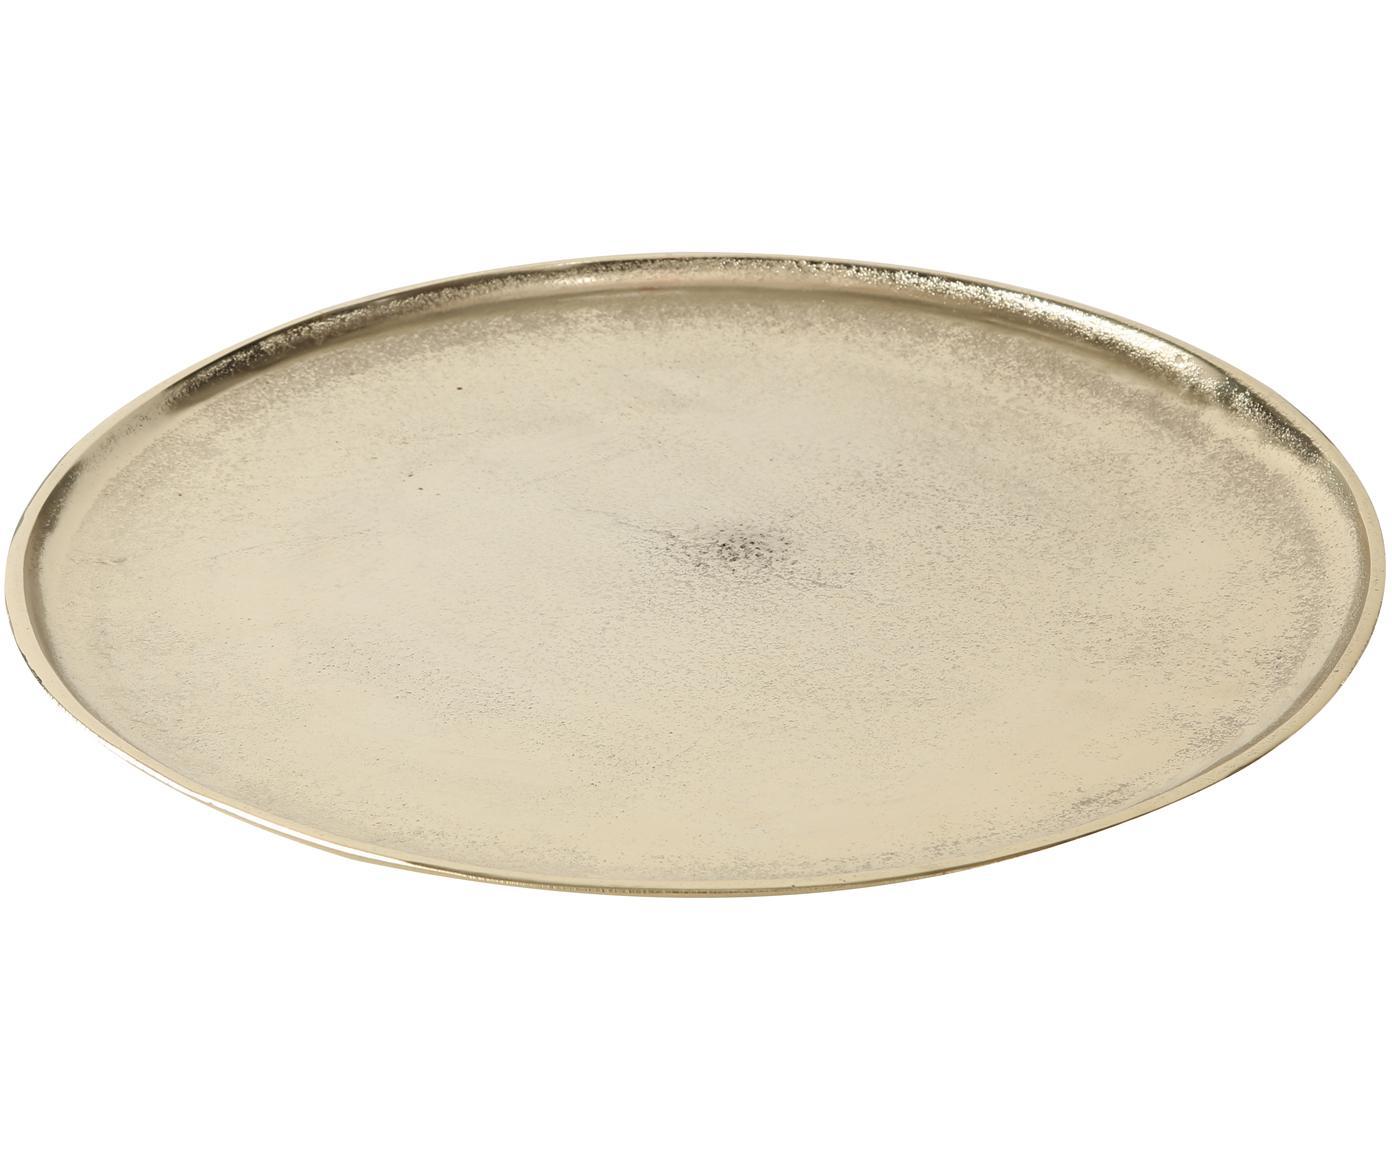 Decoratief dienblad Phönix, Aluminium, Messingkleurig, Ø 42 cm